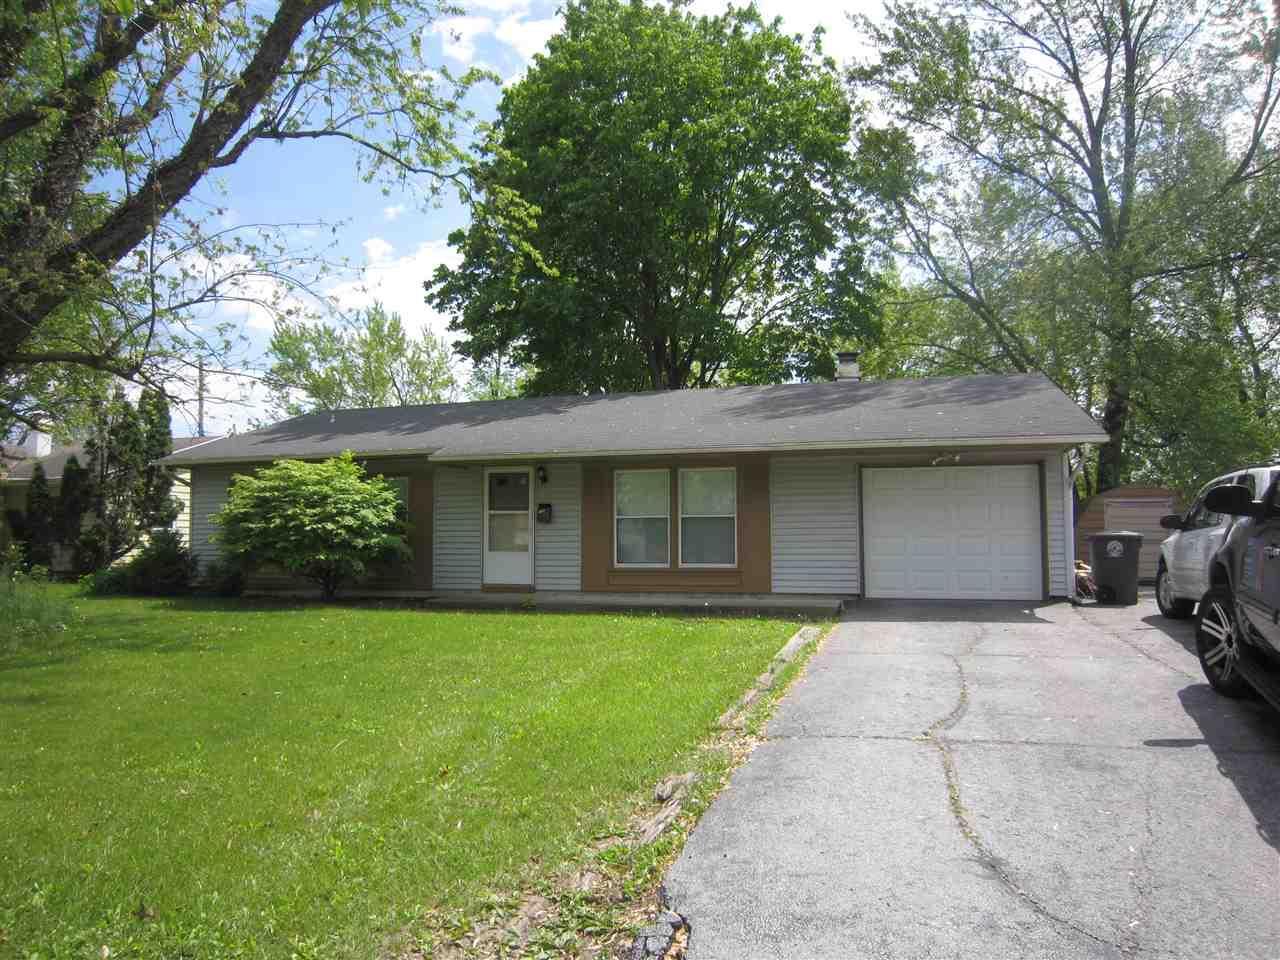 1405 Lower Huntington, Fort Wayne, IN 46819